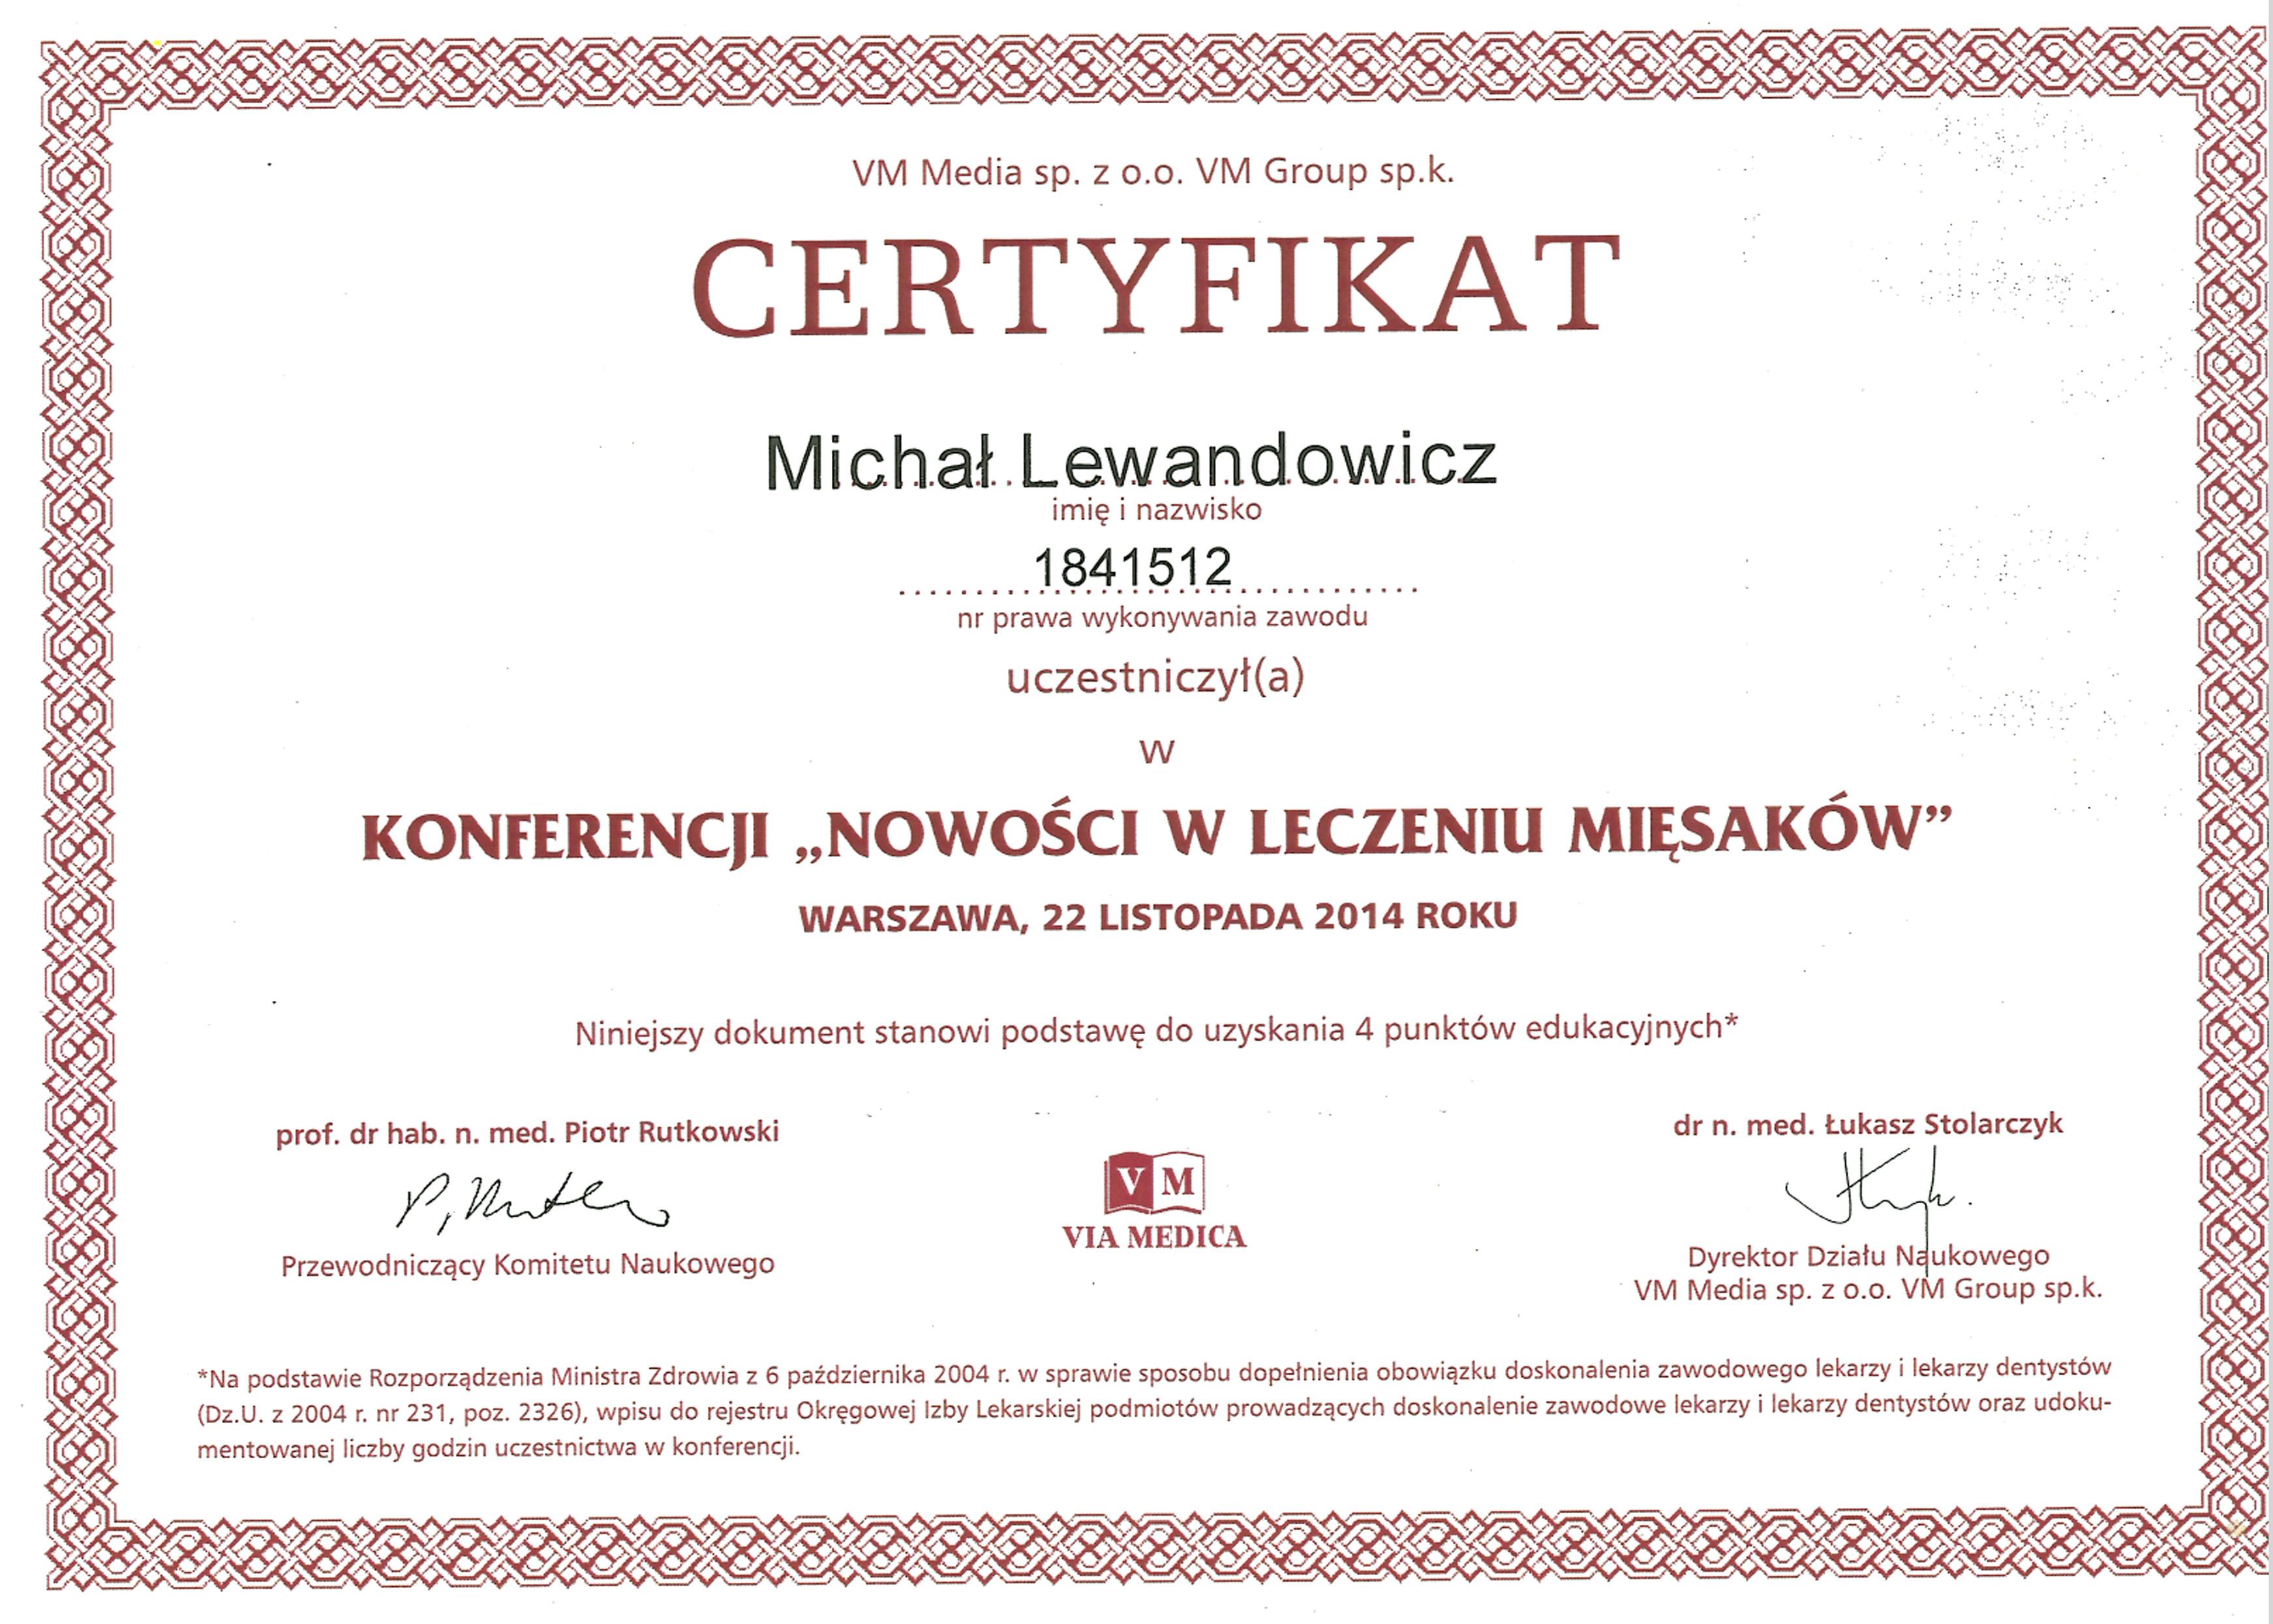 Cert Mi�saki 2014 - dr n. med. Michał Lewandowicz